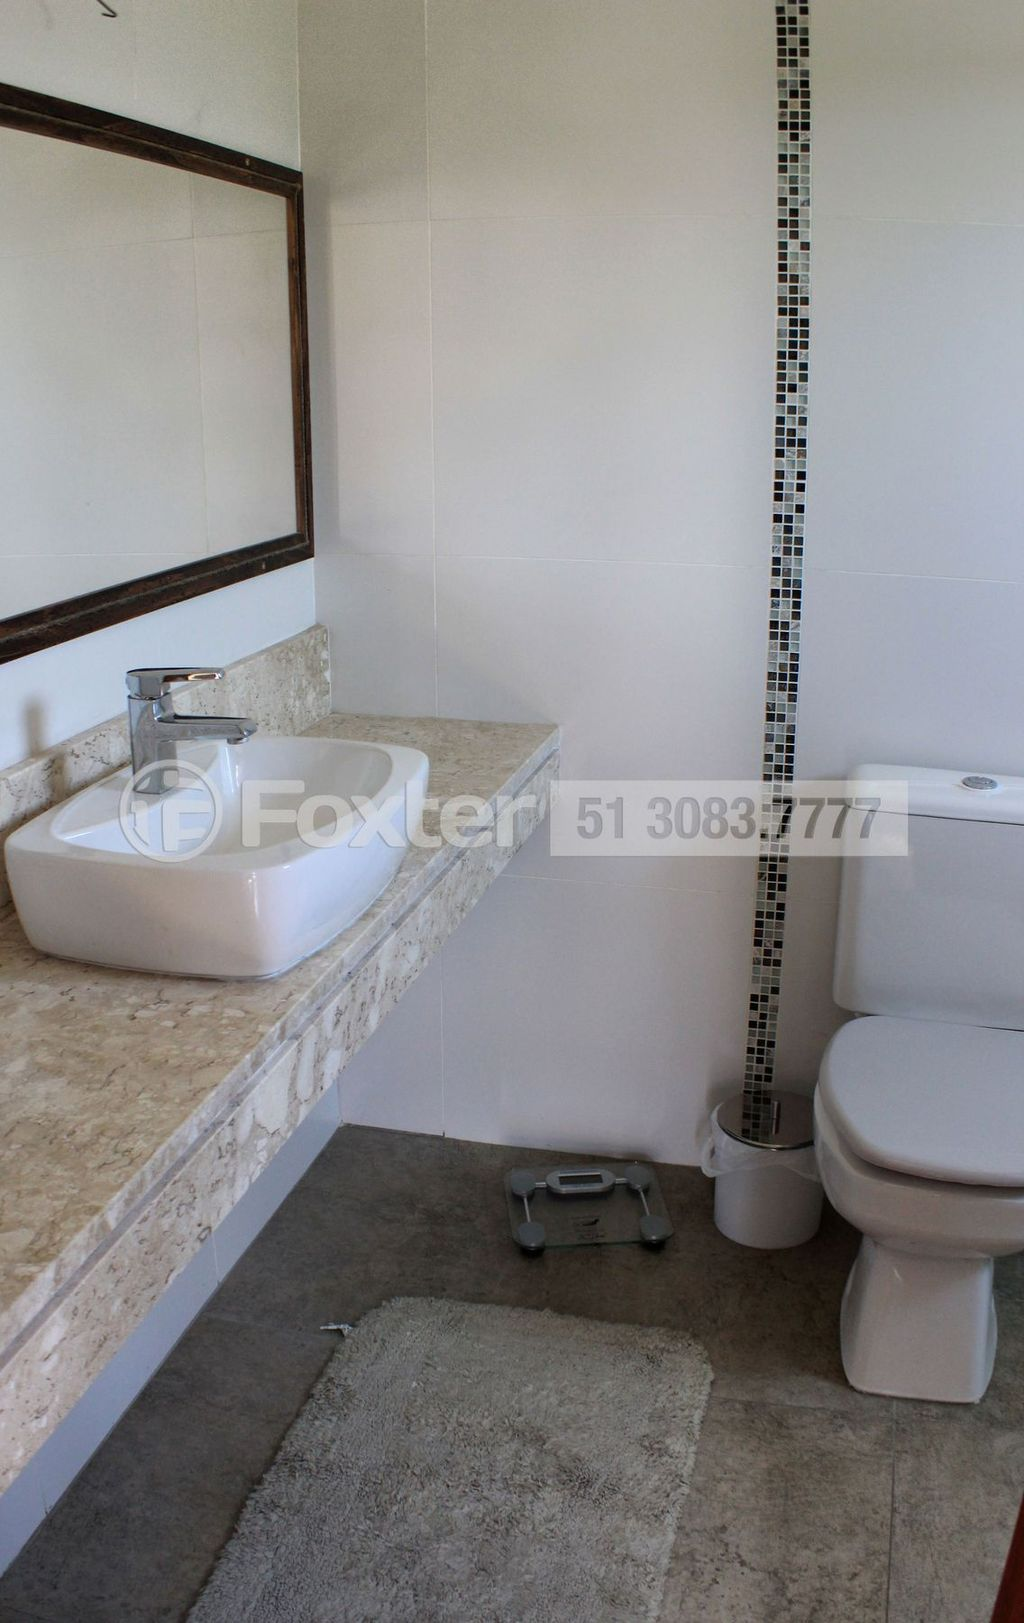 Casa 4 Dorm, Aberta dos Morros, Porto Alegre (130978) - Foto 17